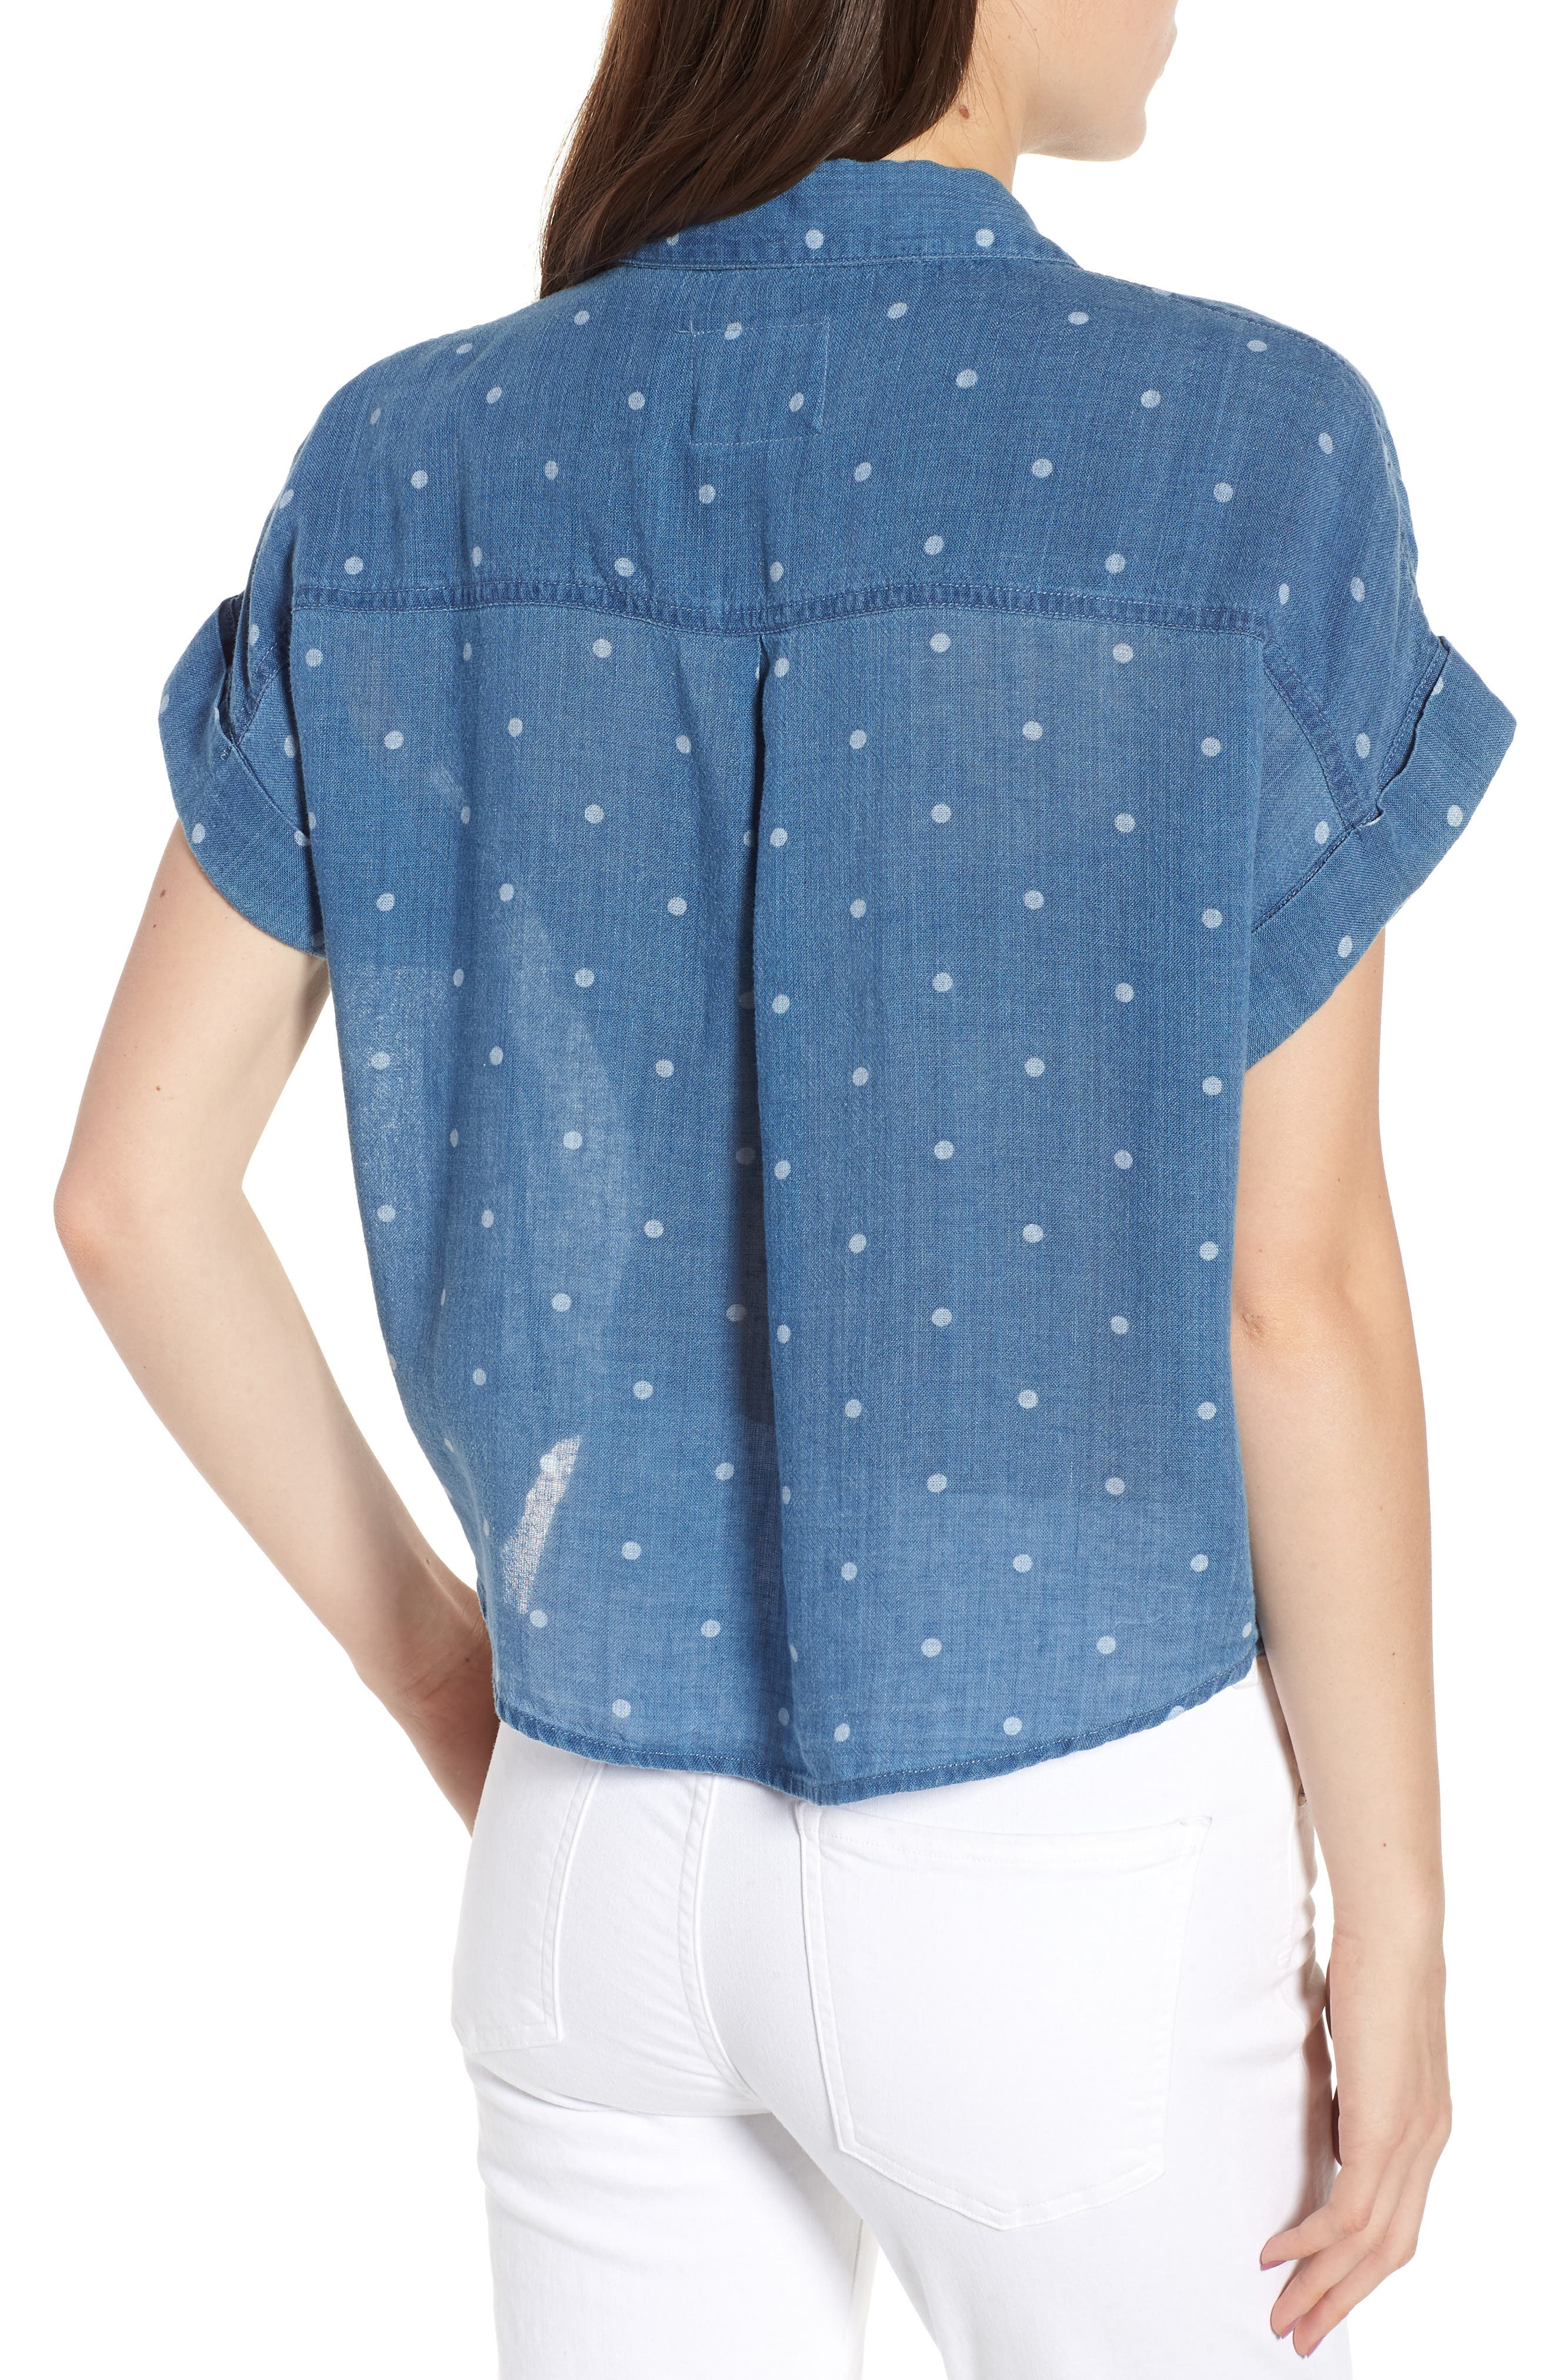 Amelie Tie Front Shirt,                             Alternate thumbnail 2, color,                             INDIGO WHITE POLKA DOTS